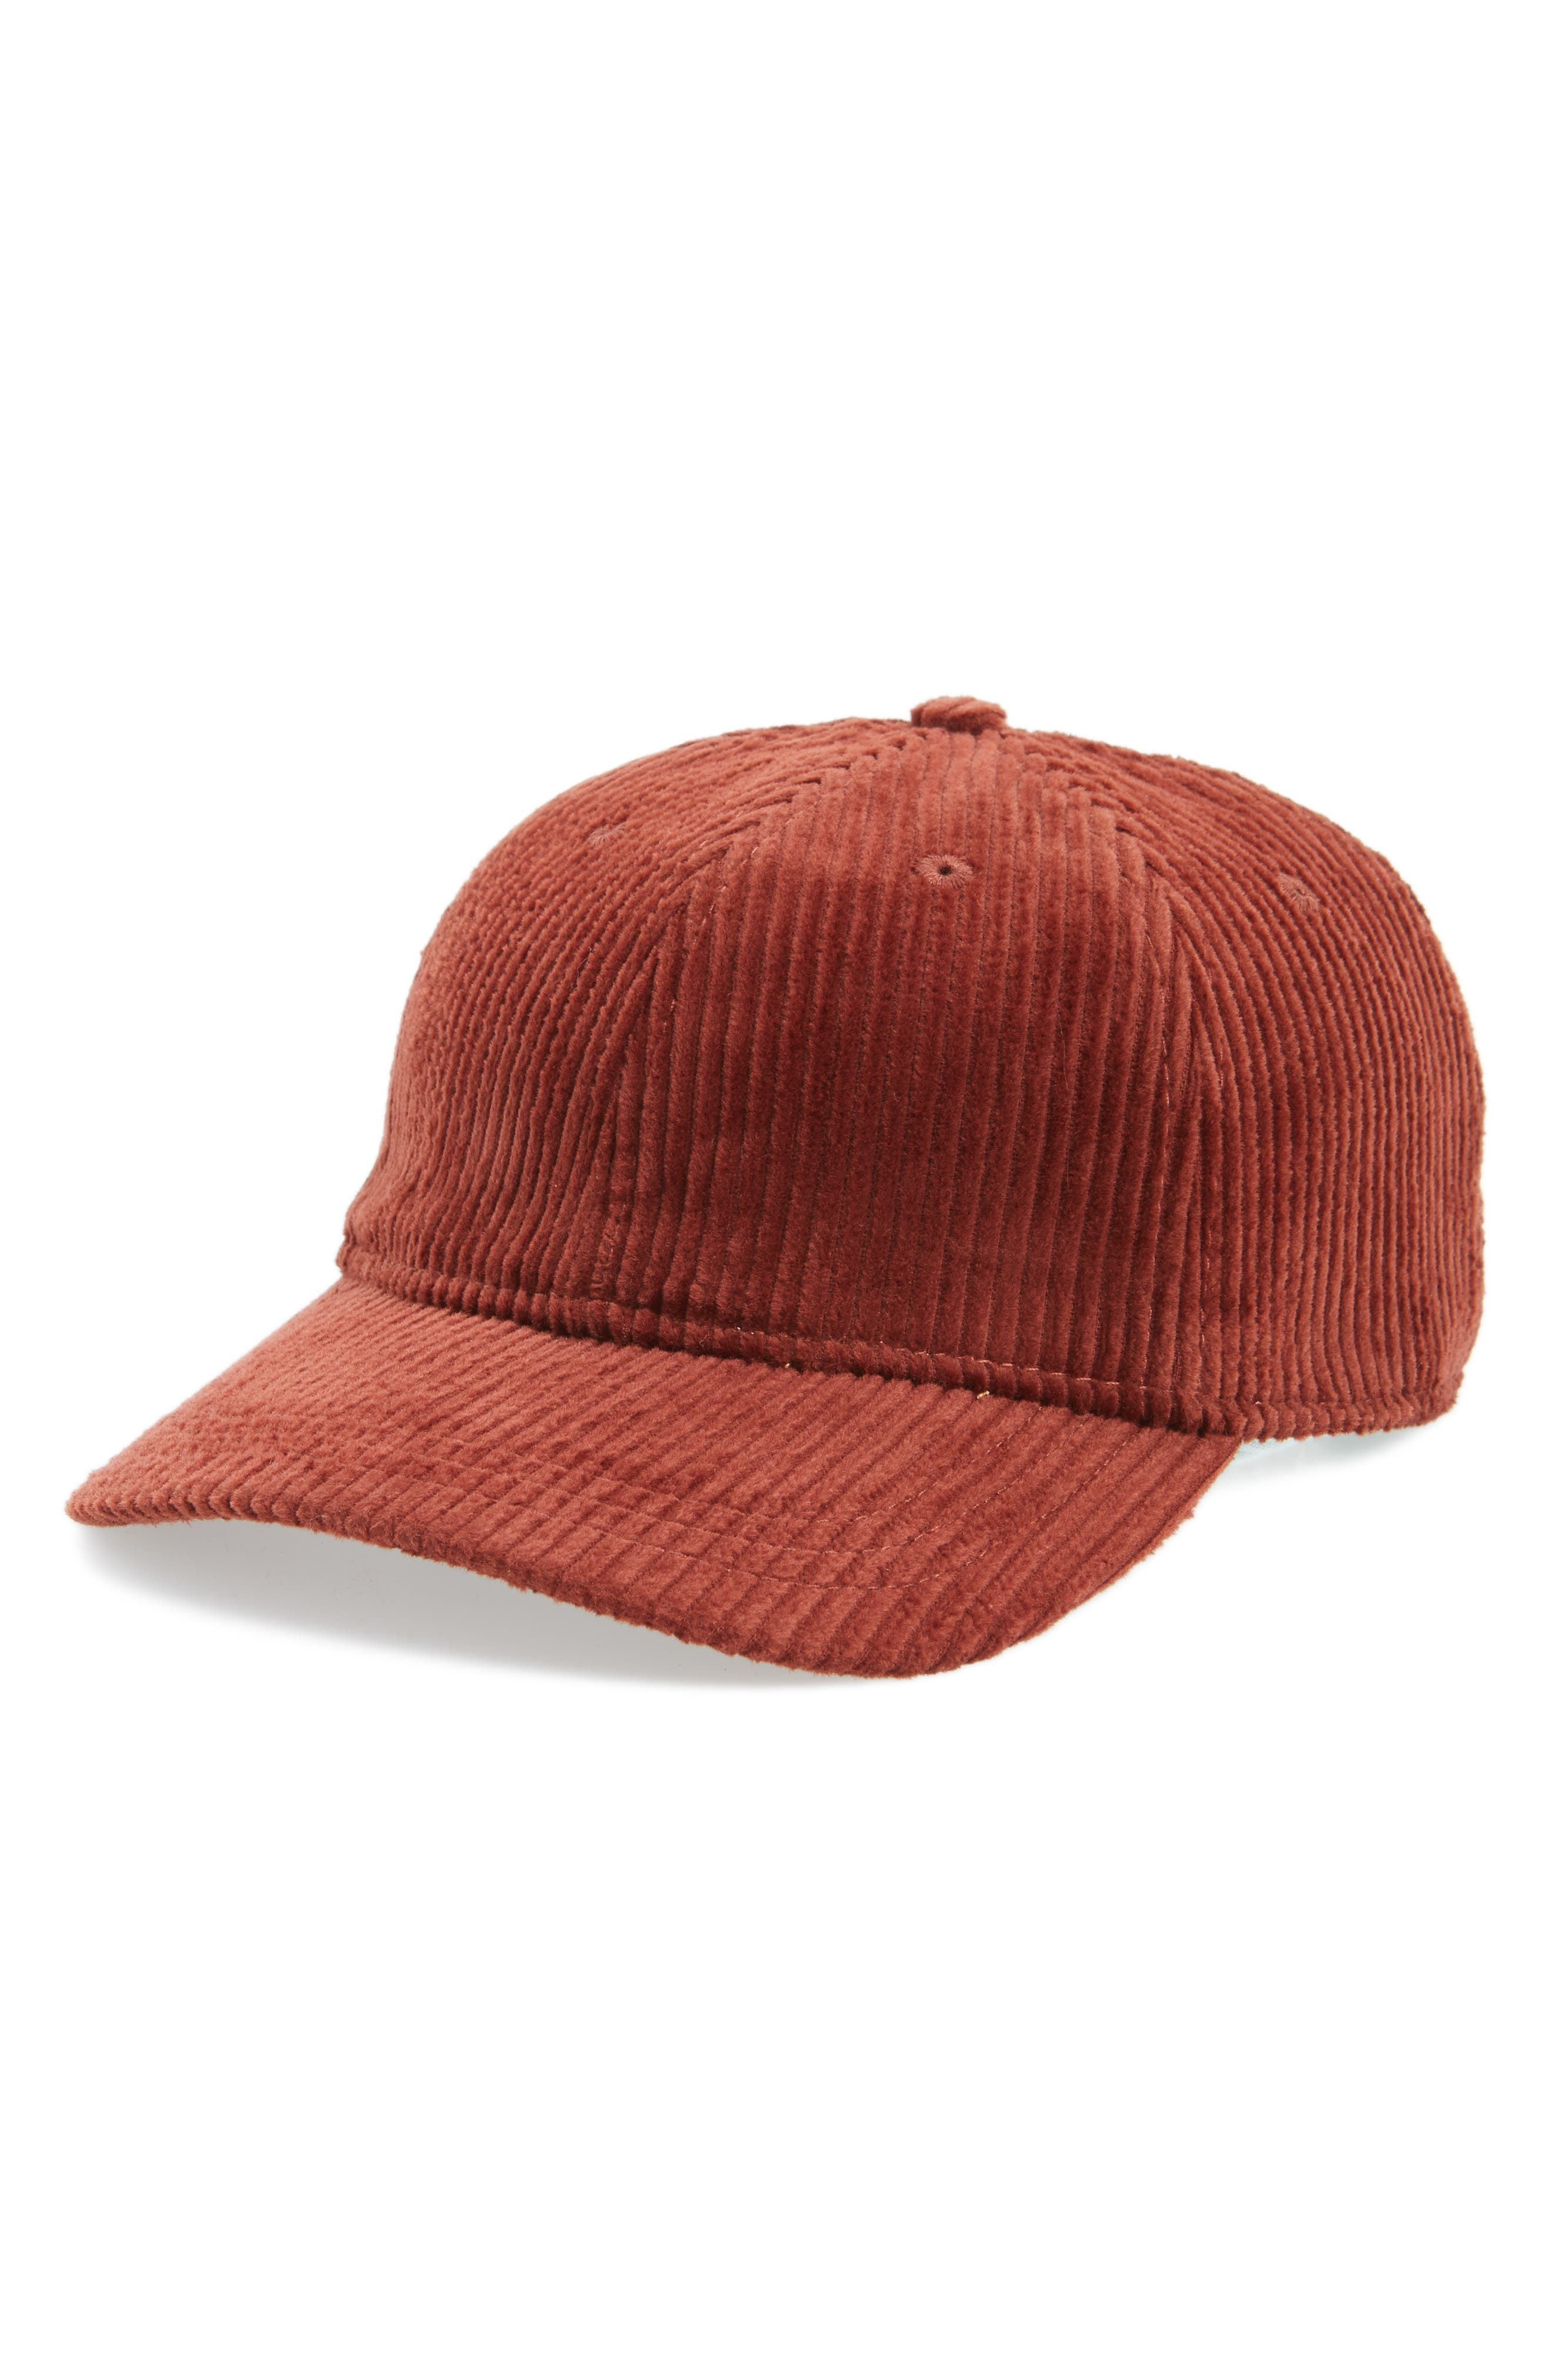 Corduroy Baseball Cap,                         Main,                         color, 930